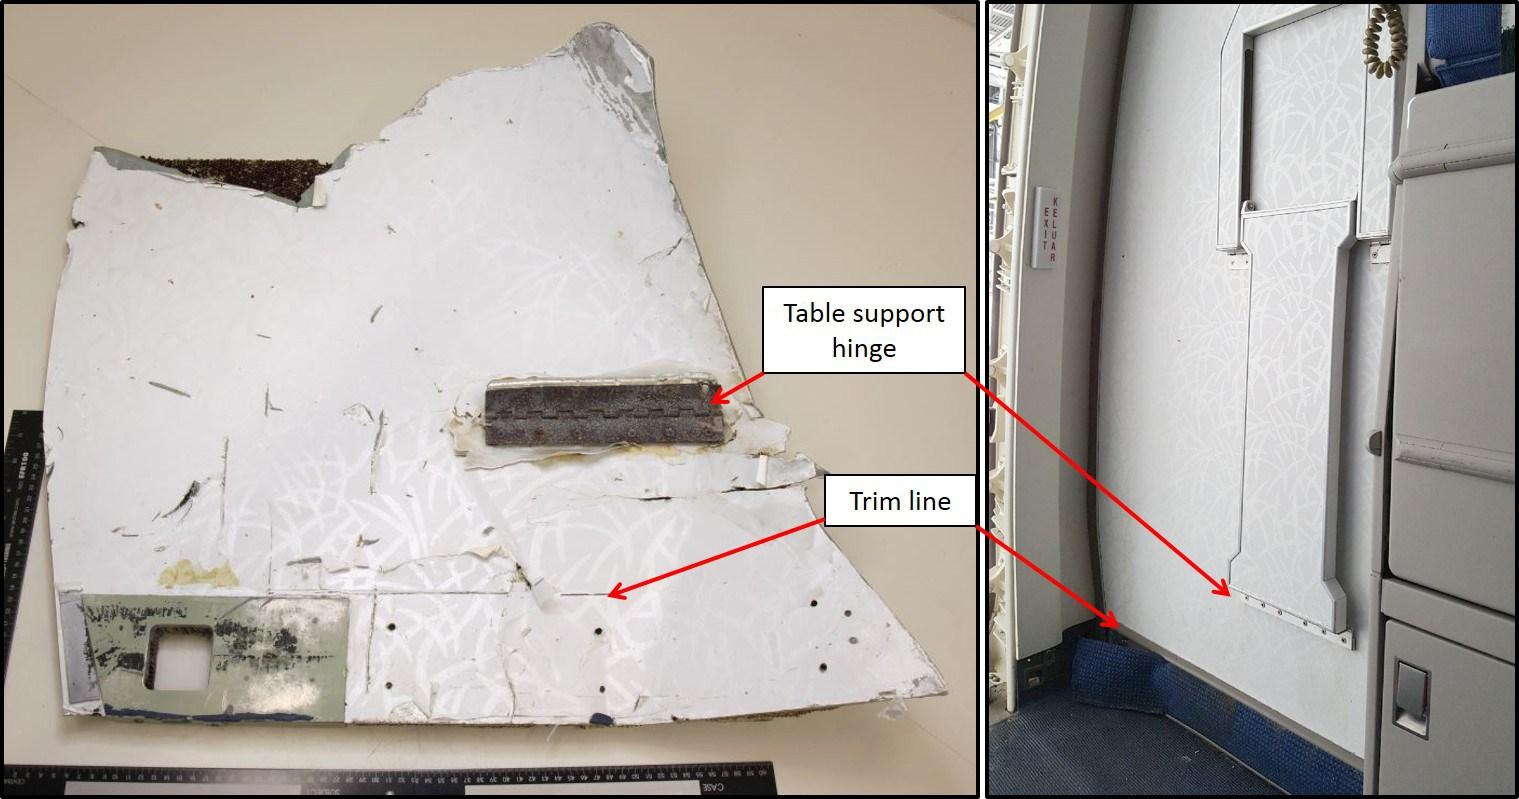 rid17-door-r1-panel-comparison.jpg